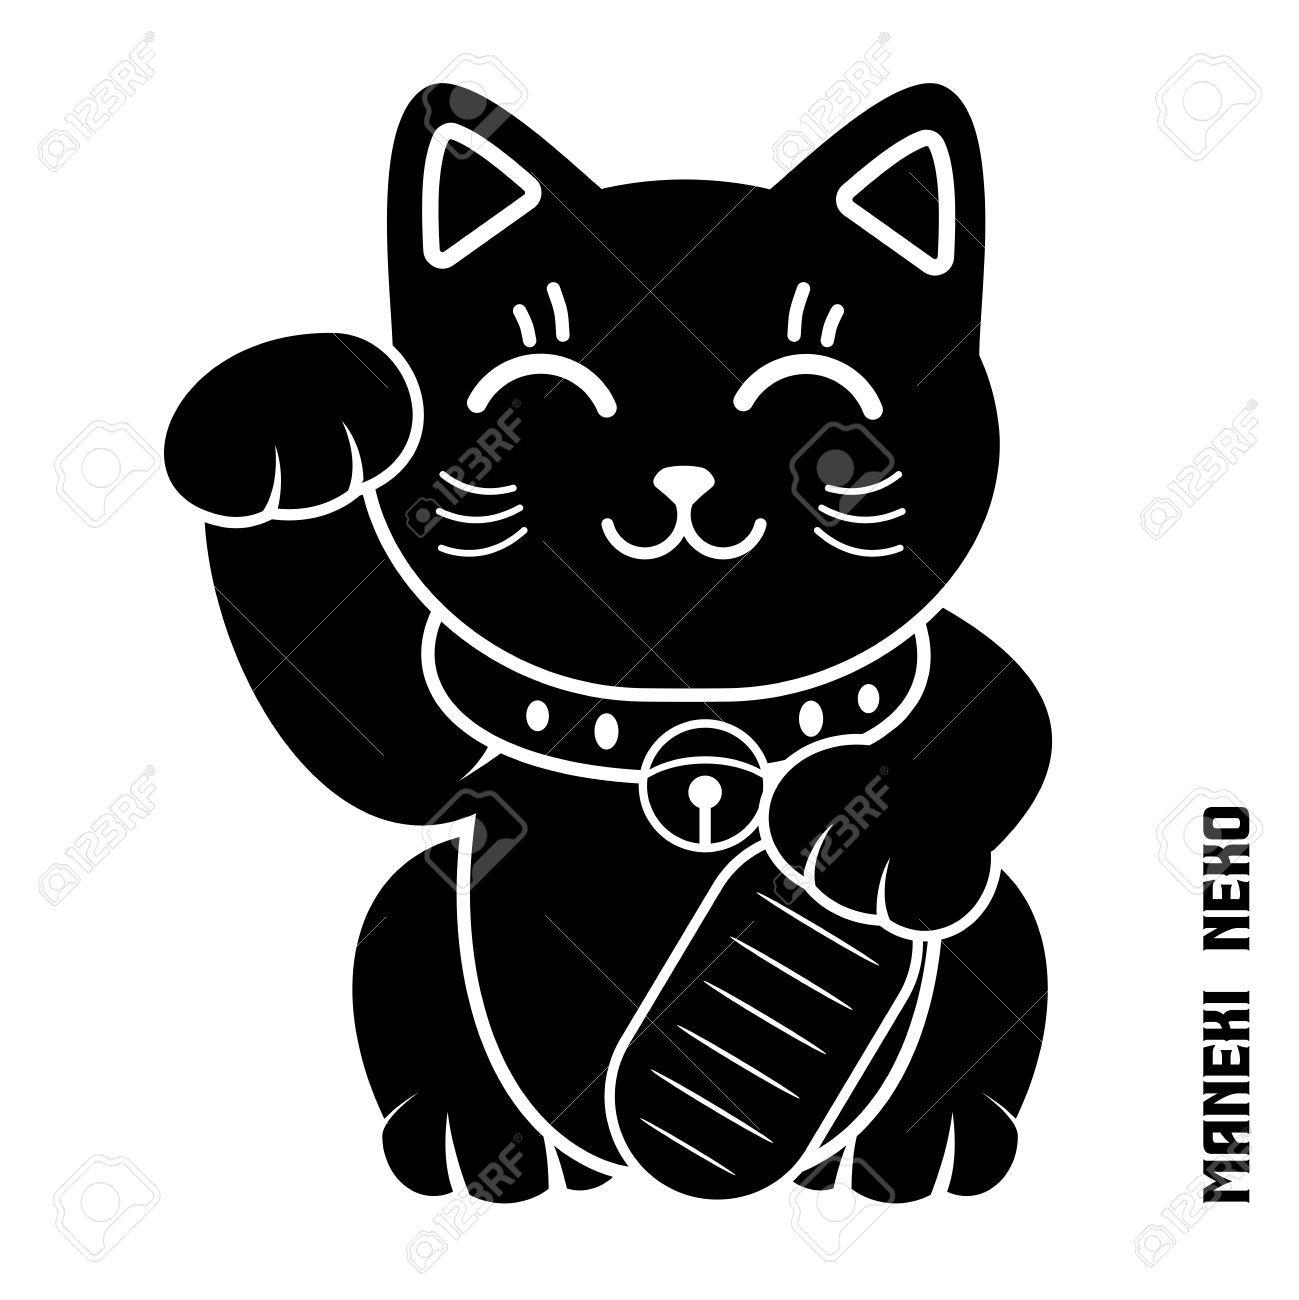 Vector Japanese Lucky Cat Illustration maneki Neko maneki cat Dollar cat